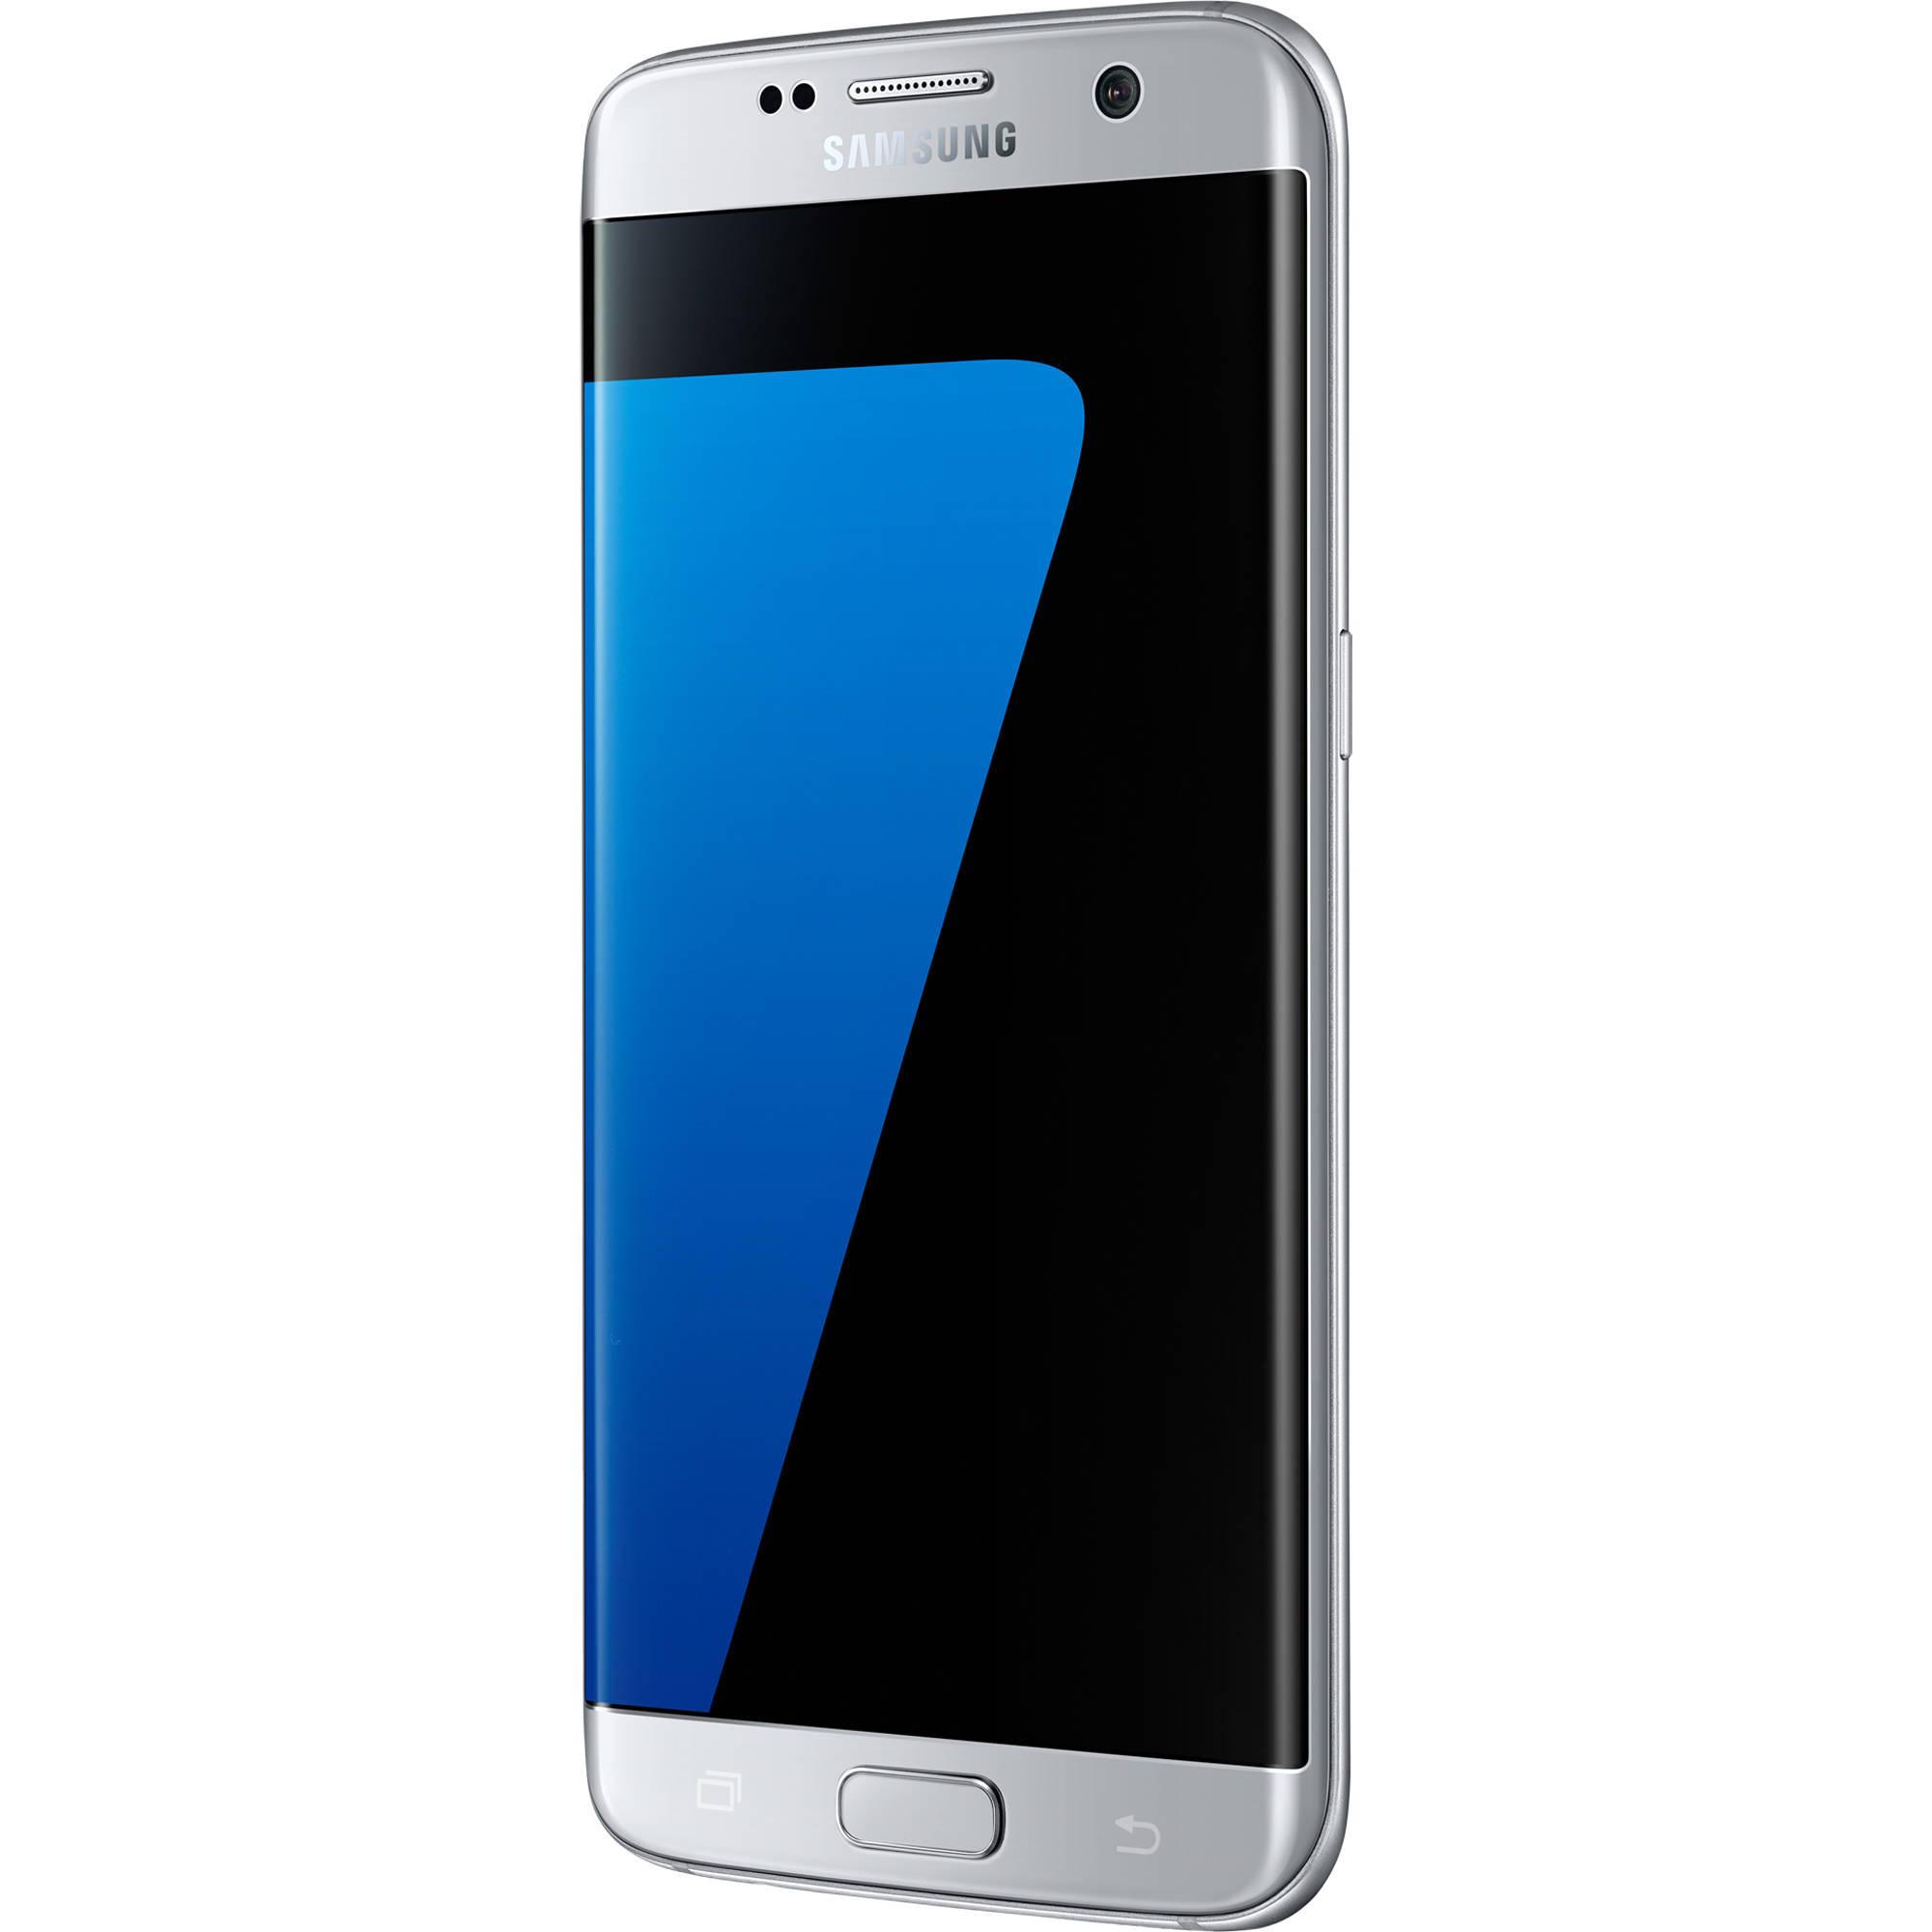 Samsung Galaxy S7 Edge 32GB Unlocked GSM LTE 5.5'' Octa-Core Android ...